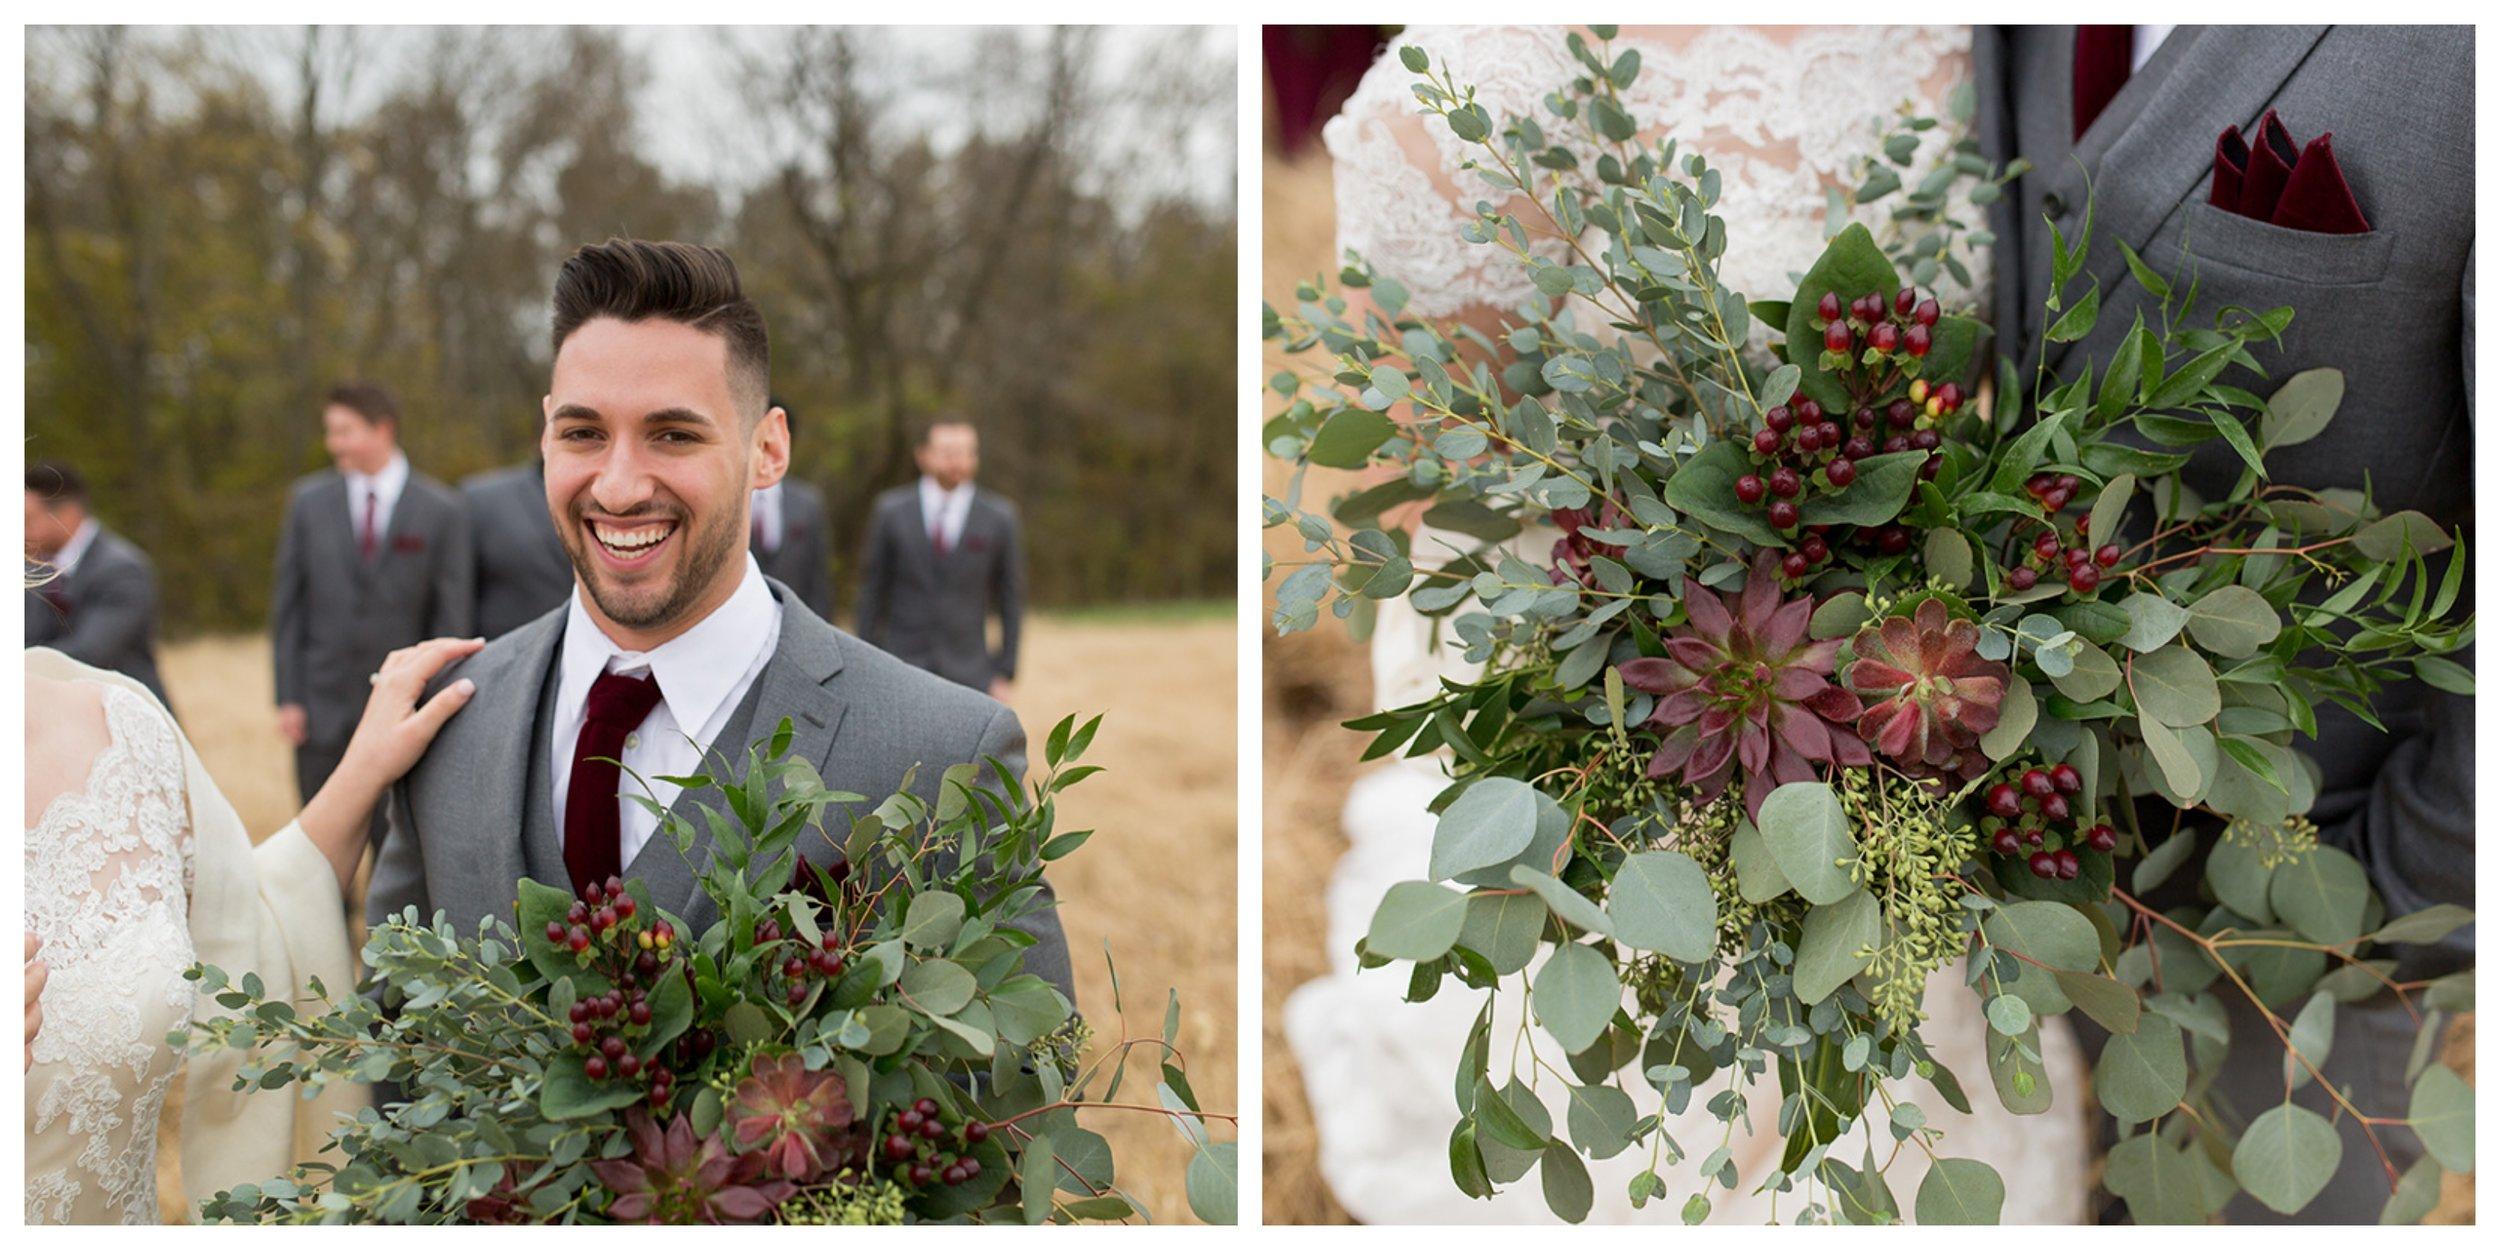 WeddingFlowers_WeddingDress_KansasCity